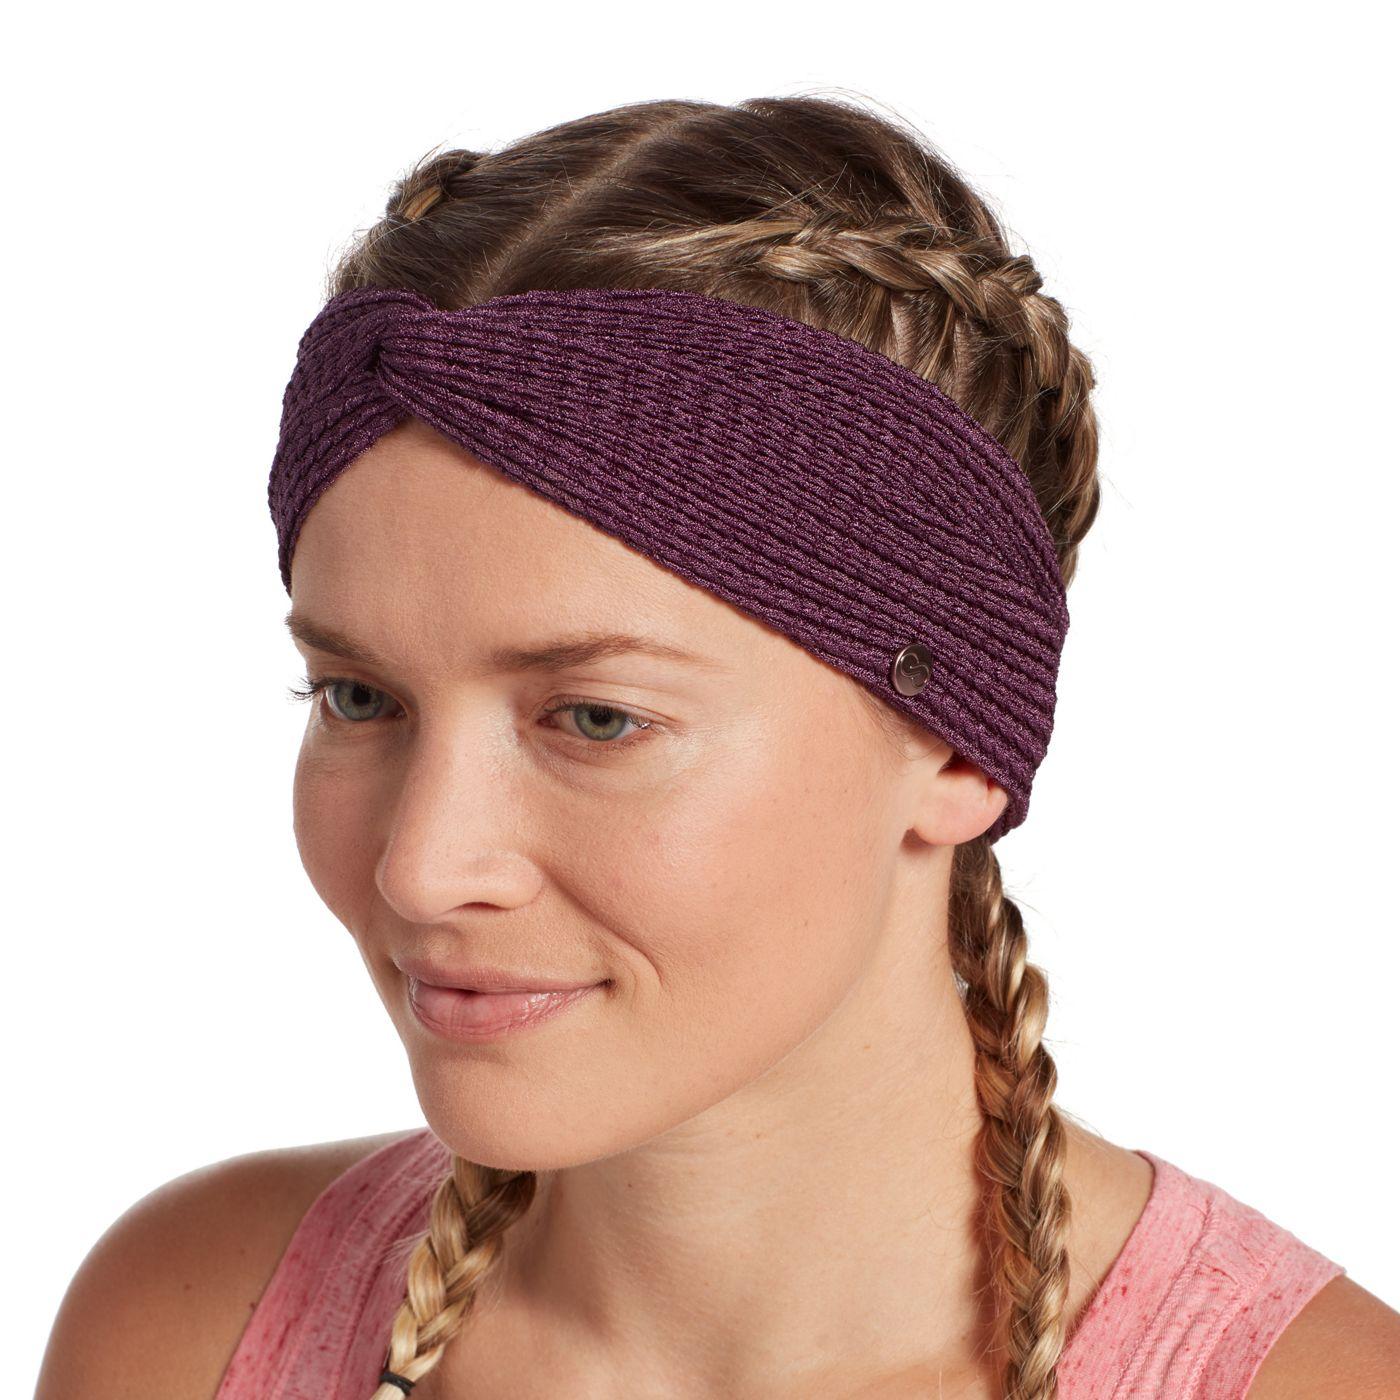 CALIA by Carrie Underwood Women's Braided Shine Headband